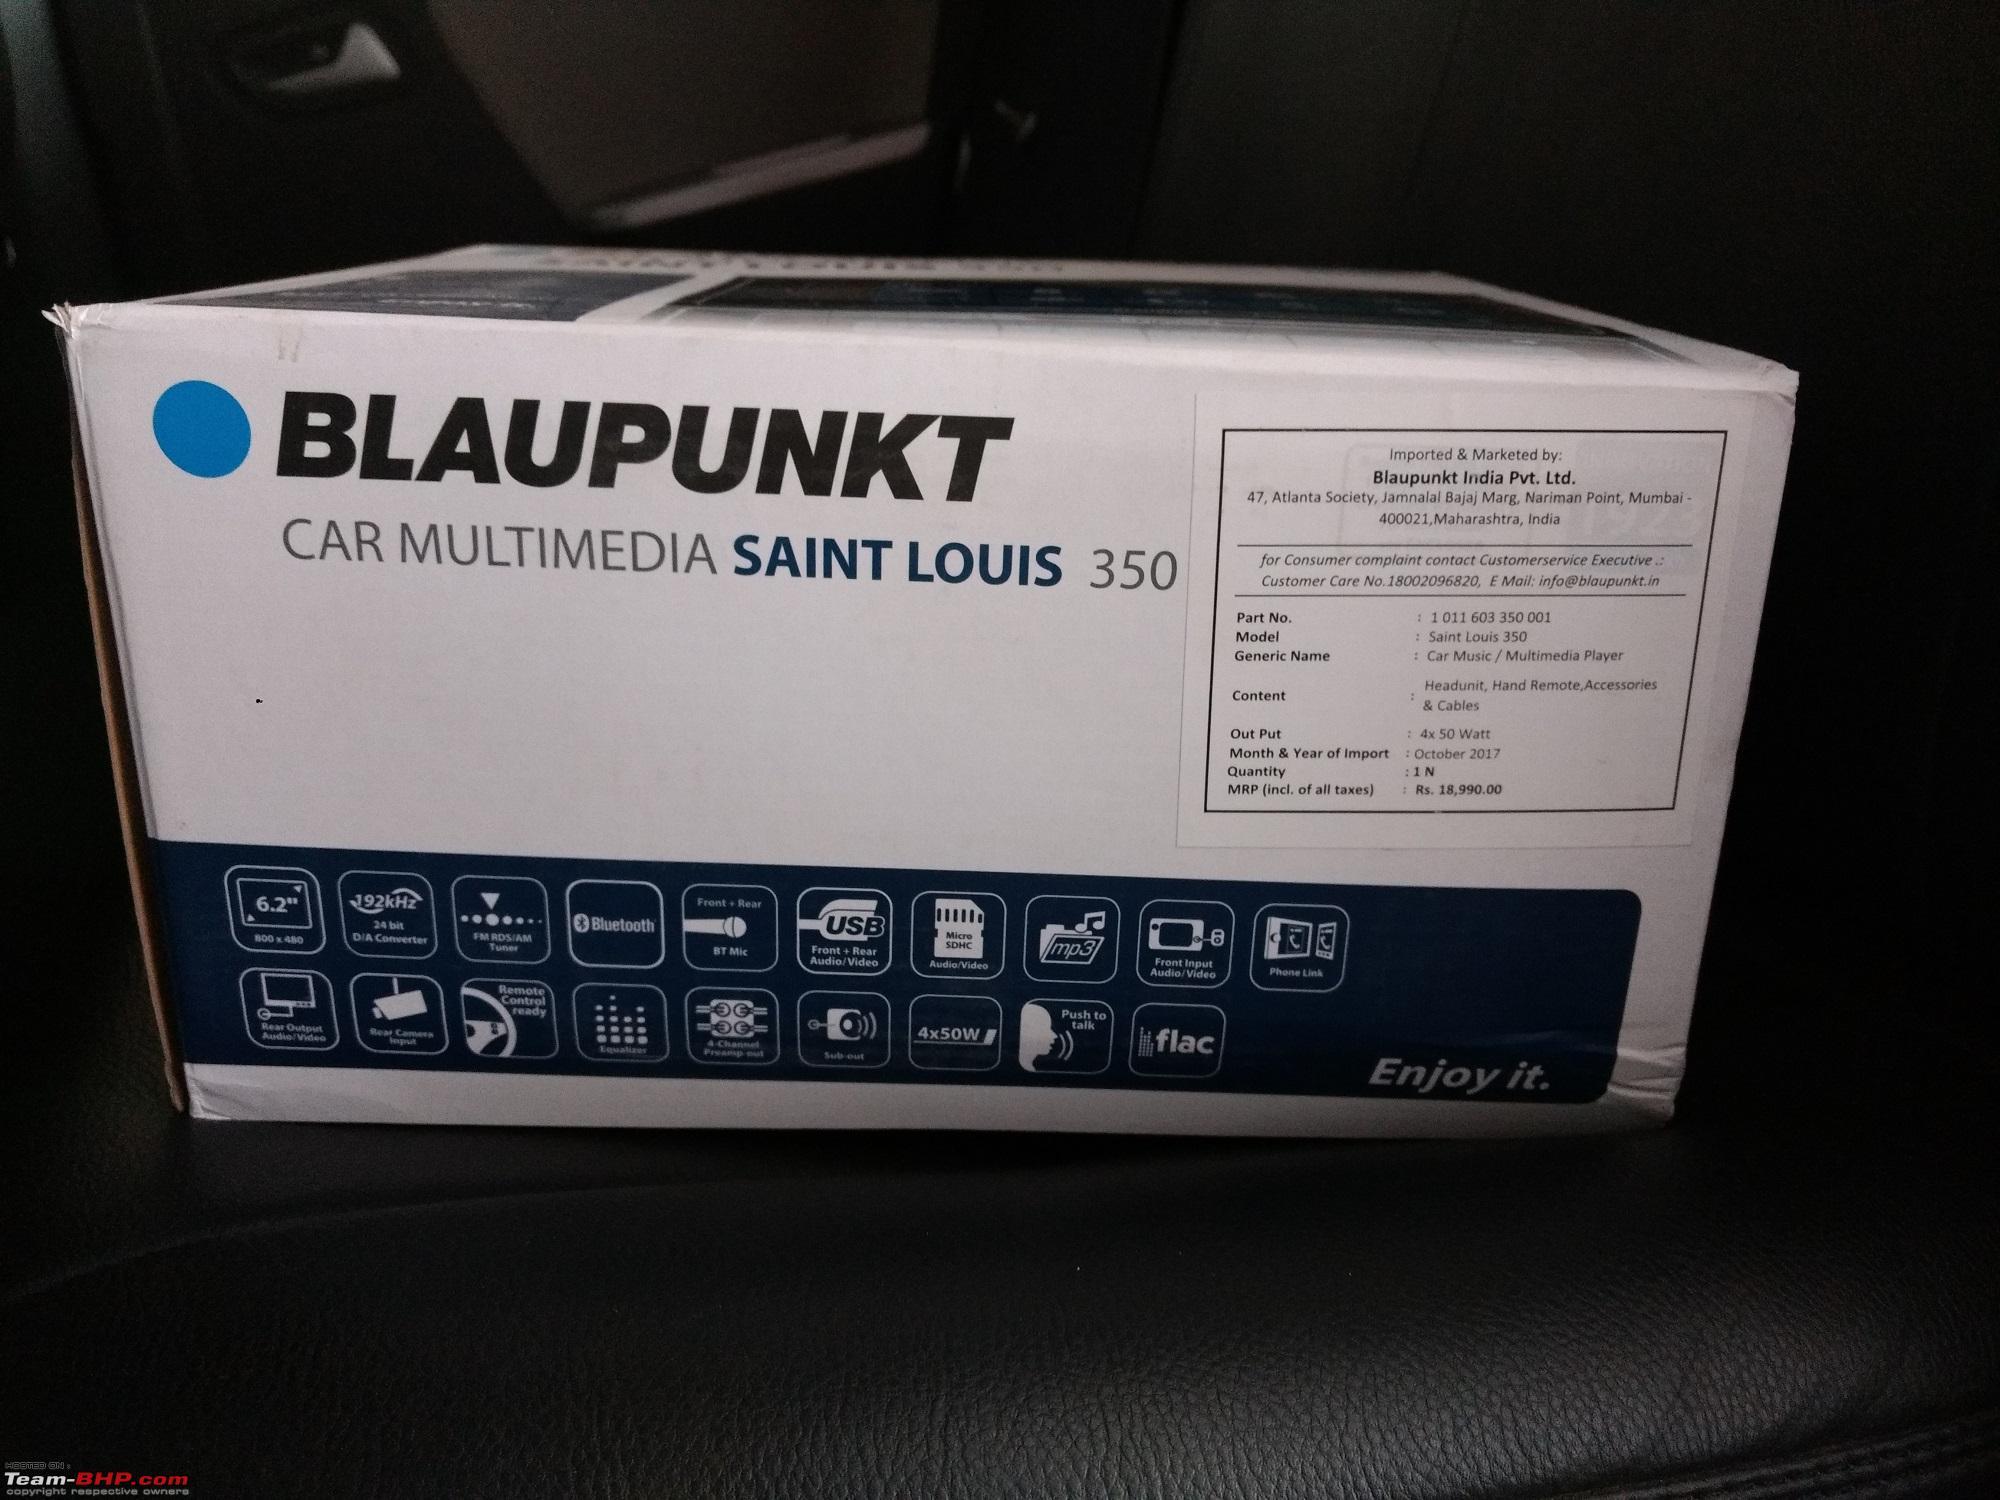 Blaupunkt saint louis 350 manual